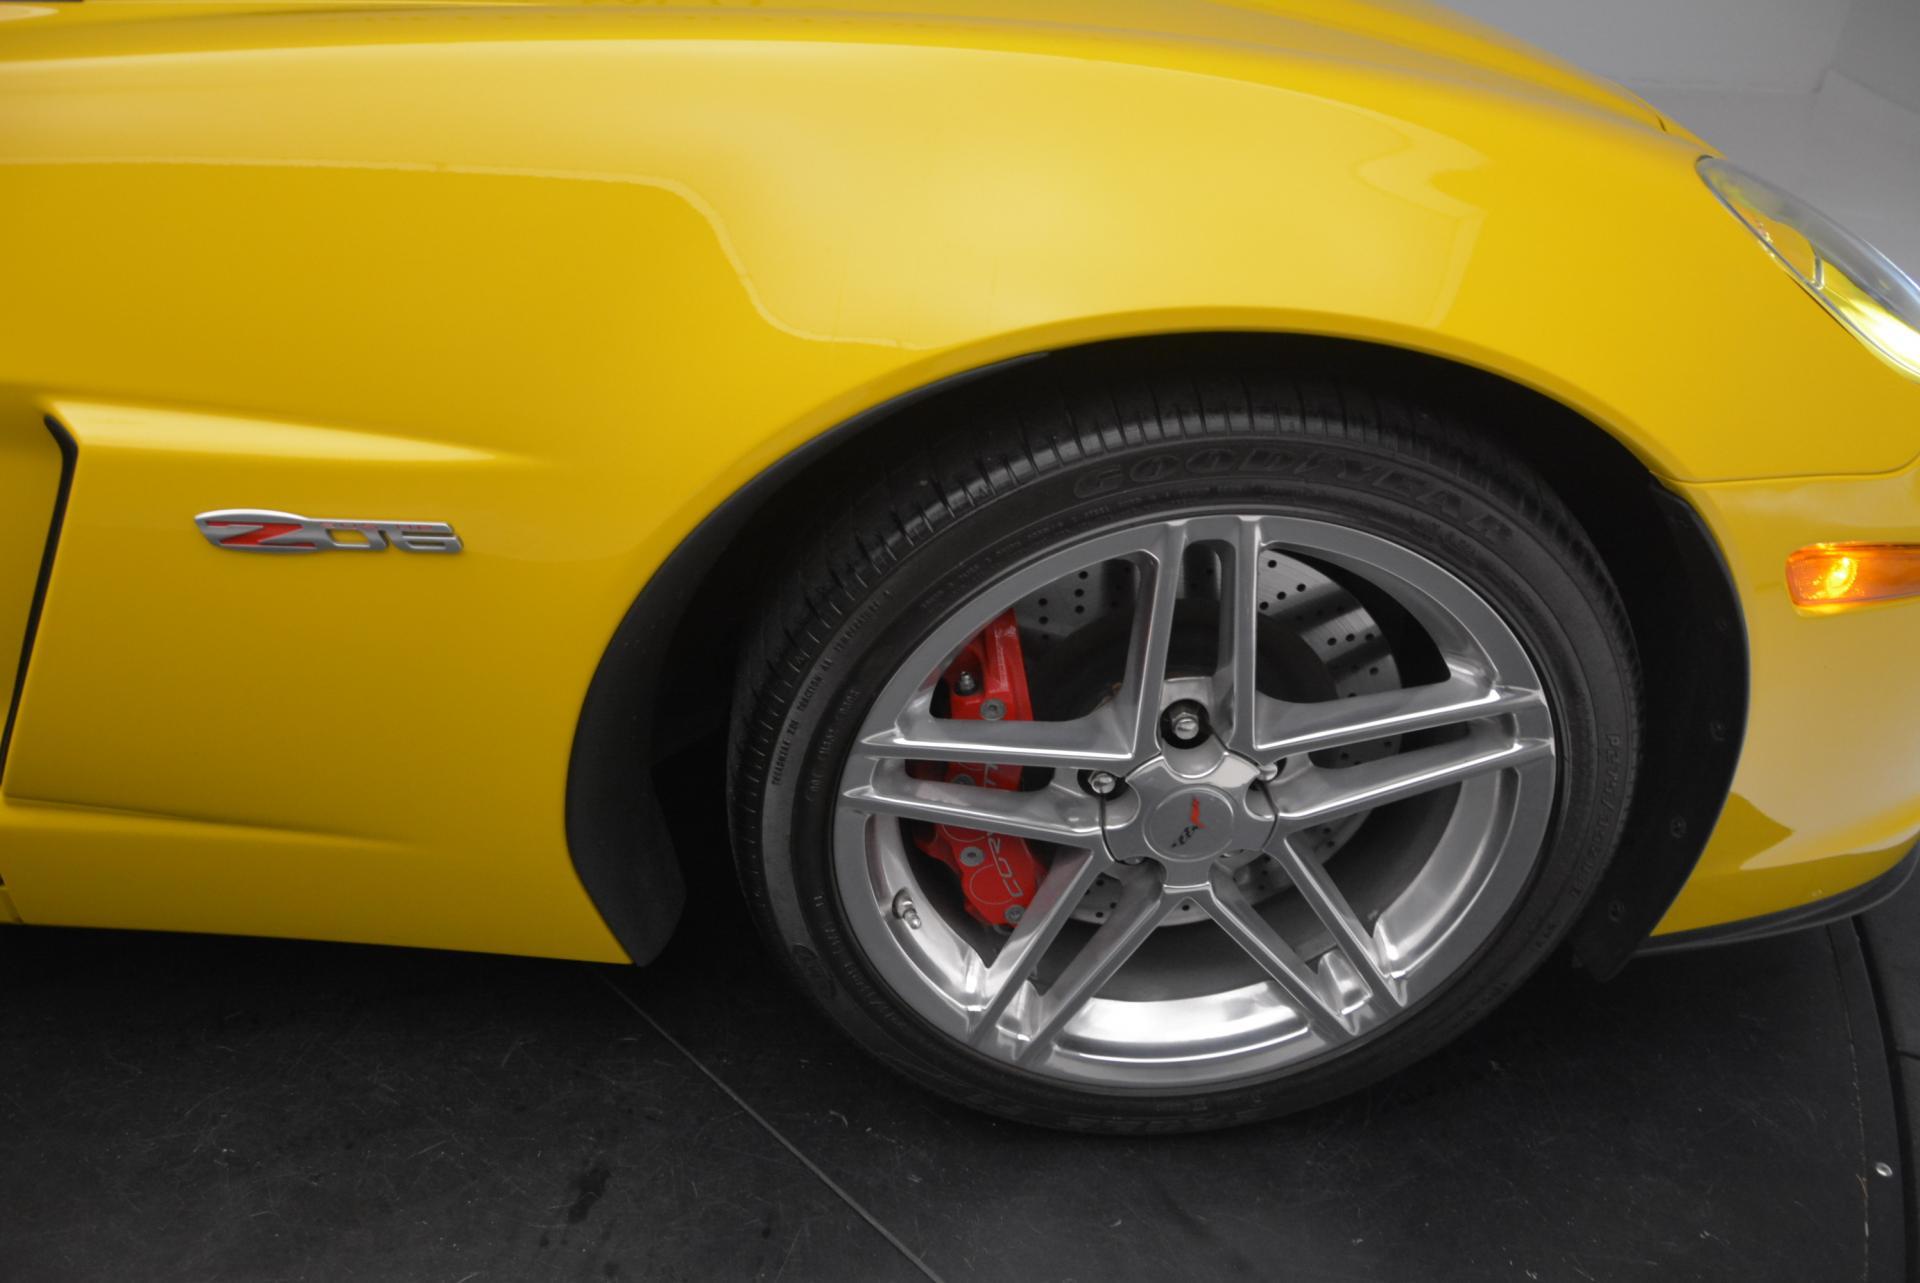 Used 2006 Chevrolet Corvette Z06 Hardtop For Sale In Greenwich, CT. Alfa Romeo of Greenwich, 7085 530_p18